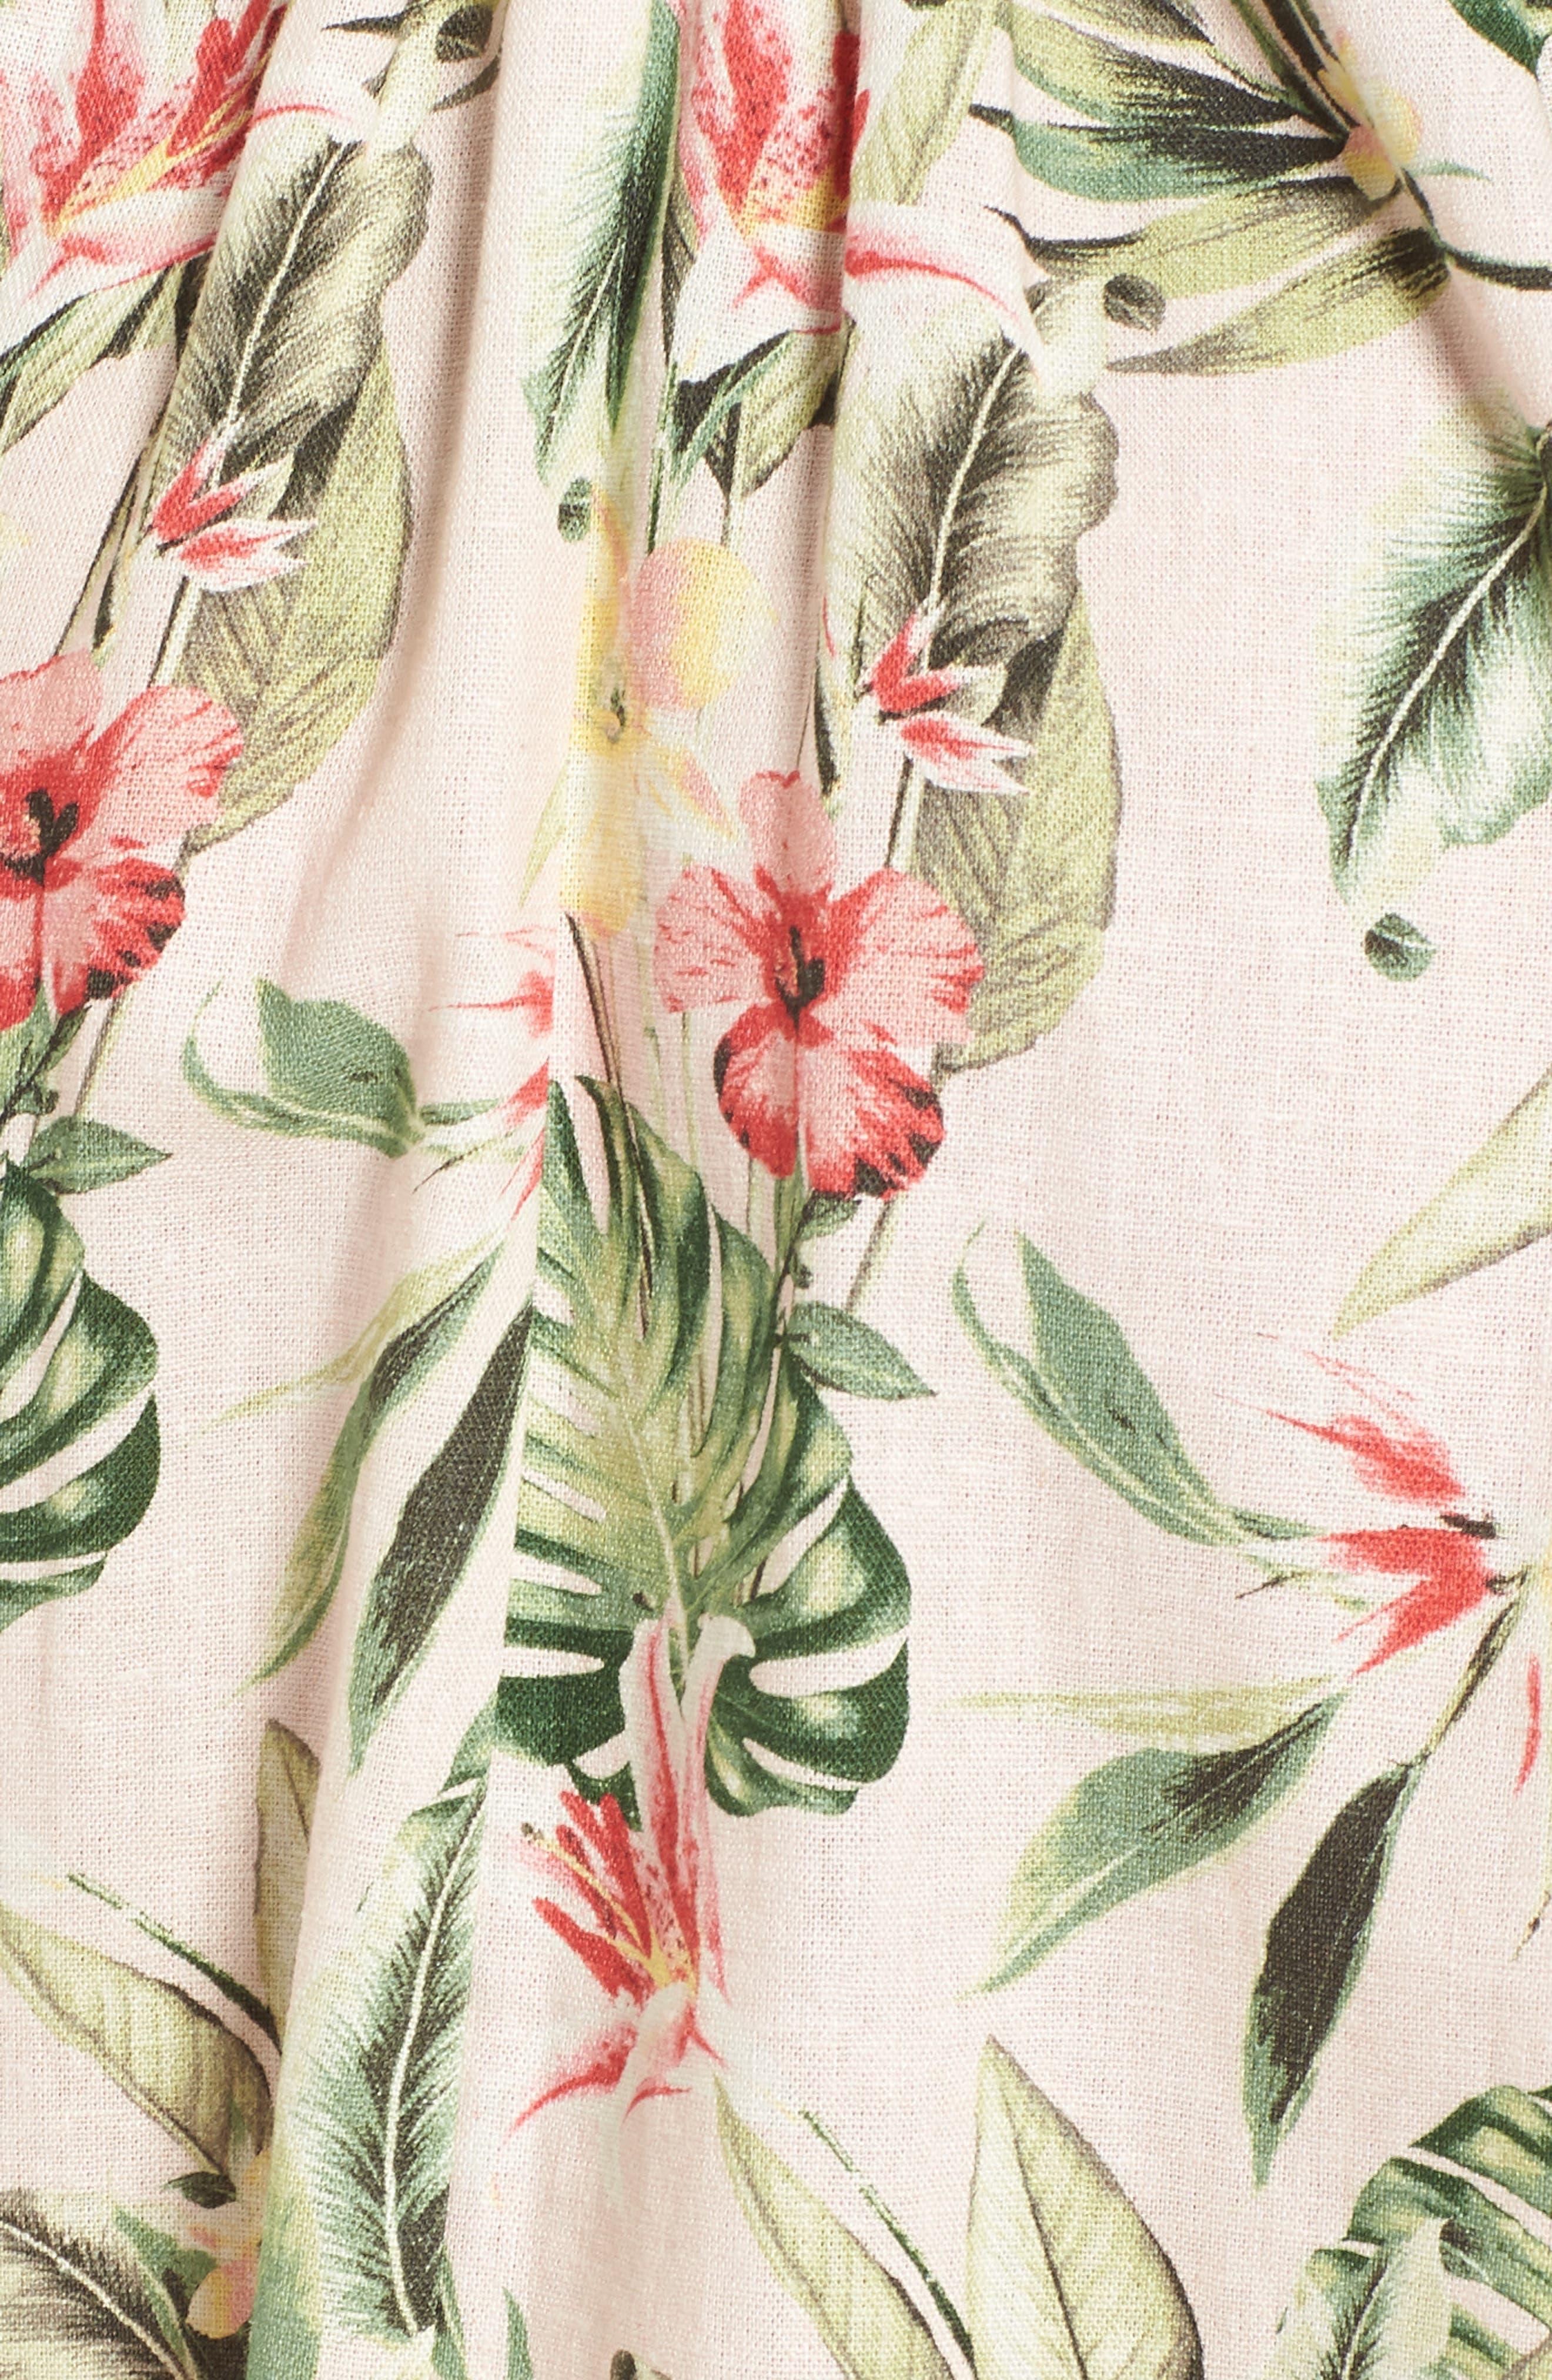 Tropical Lace Back Minidress,                             Alternate thumbnail 5, color,                             Blush/ Green